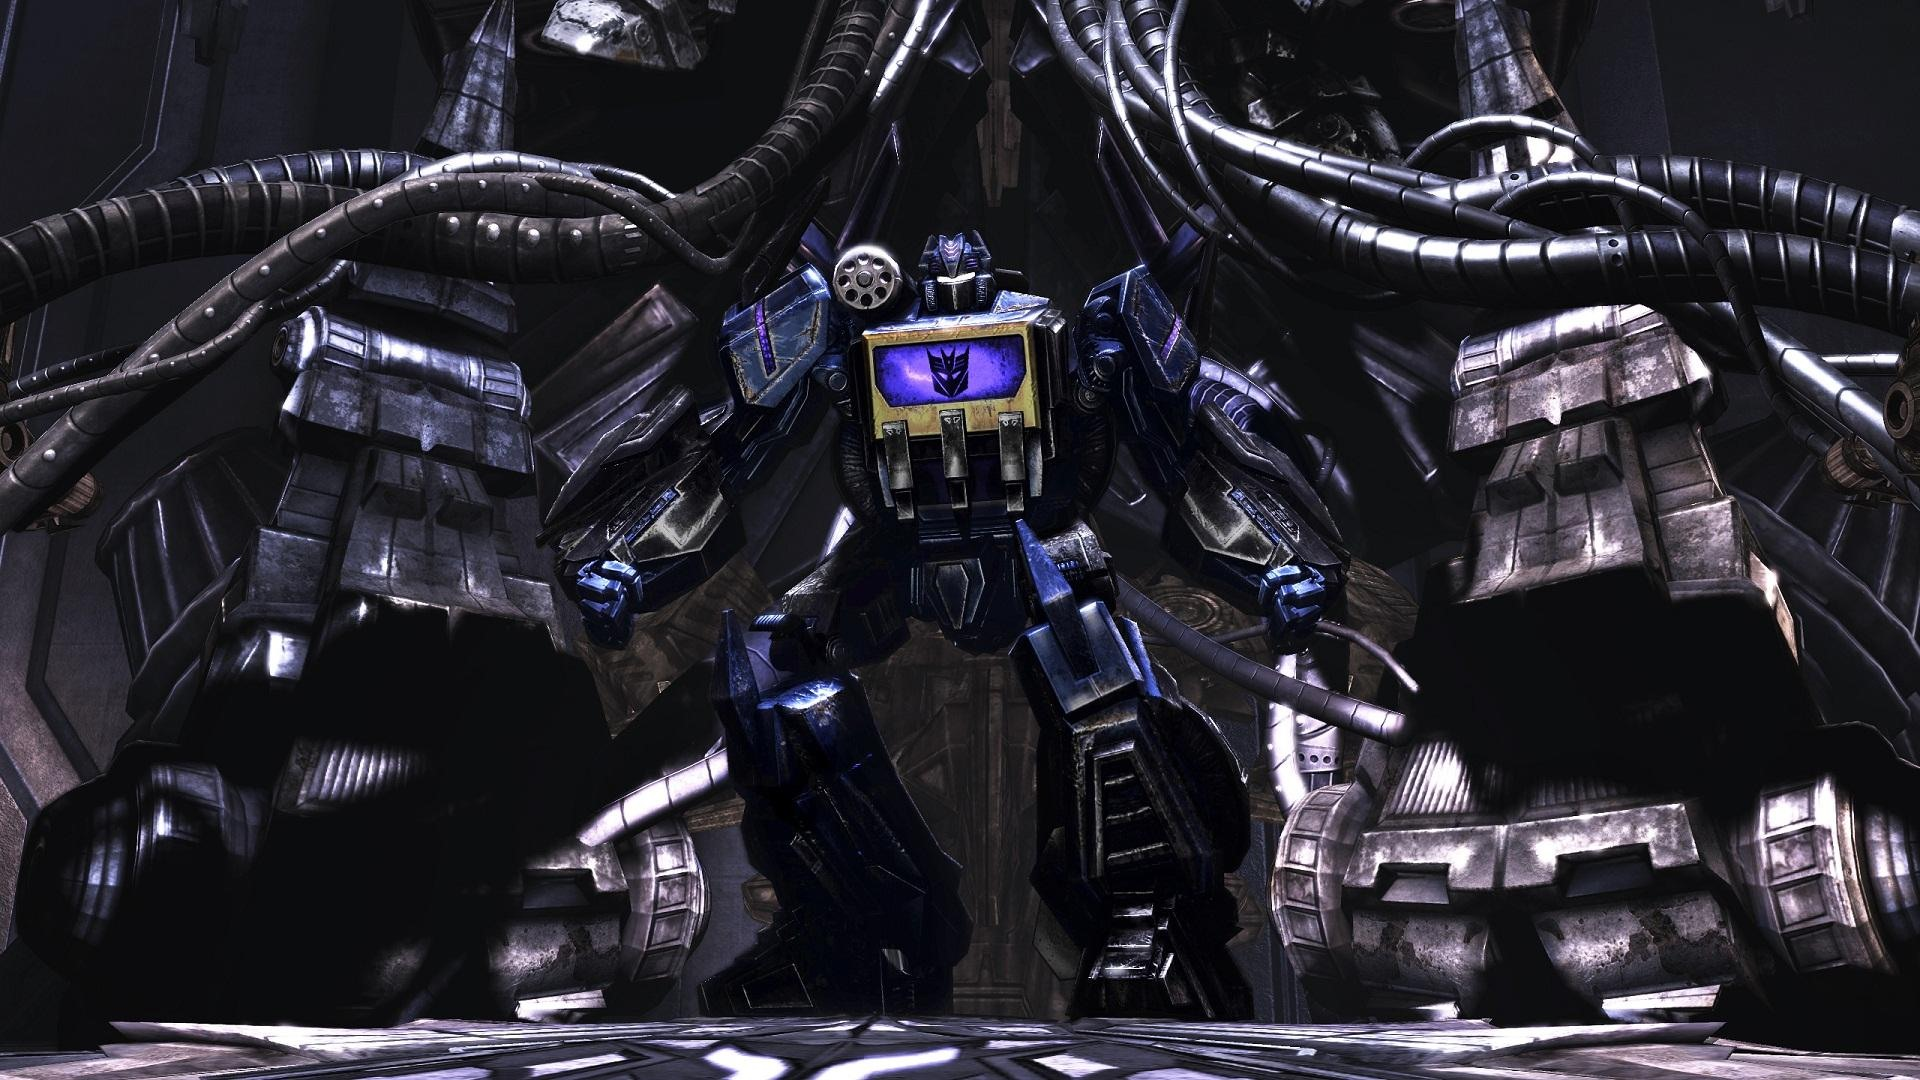 Transformers Fall of Cybertron Soundwave Wallpaper 1920x1080